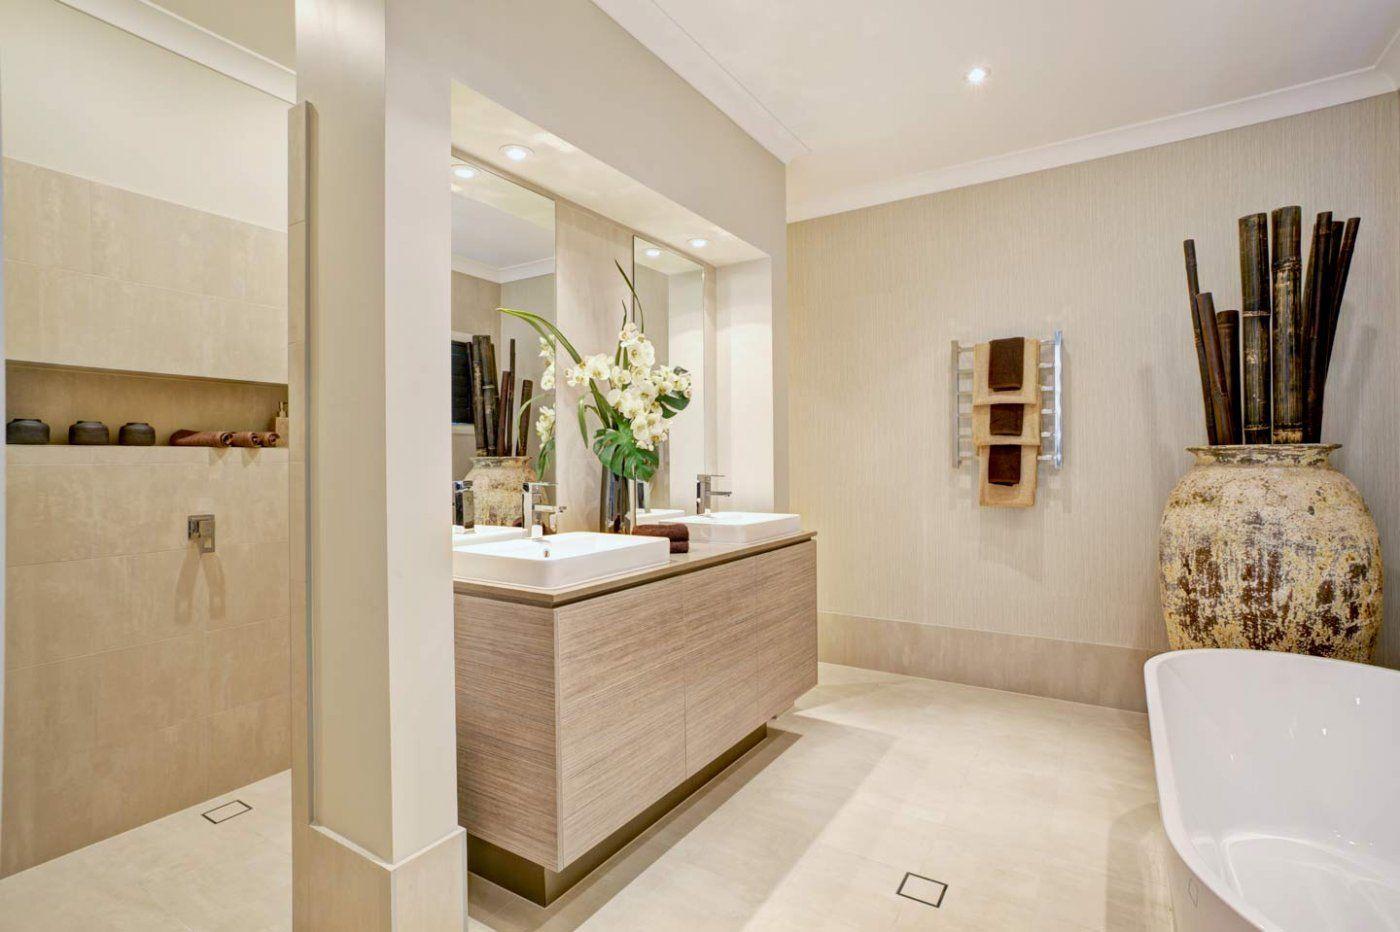 Brisbane laundry renovations laundry design ideas ine bathrooms - Laundry